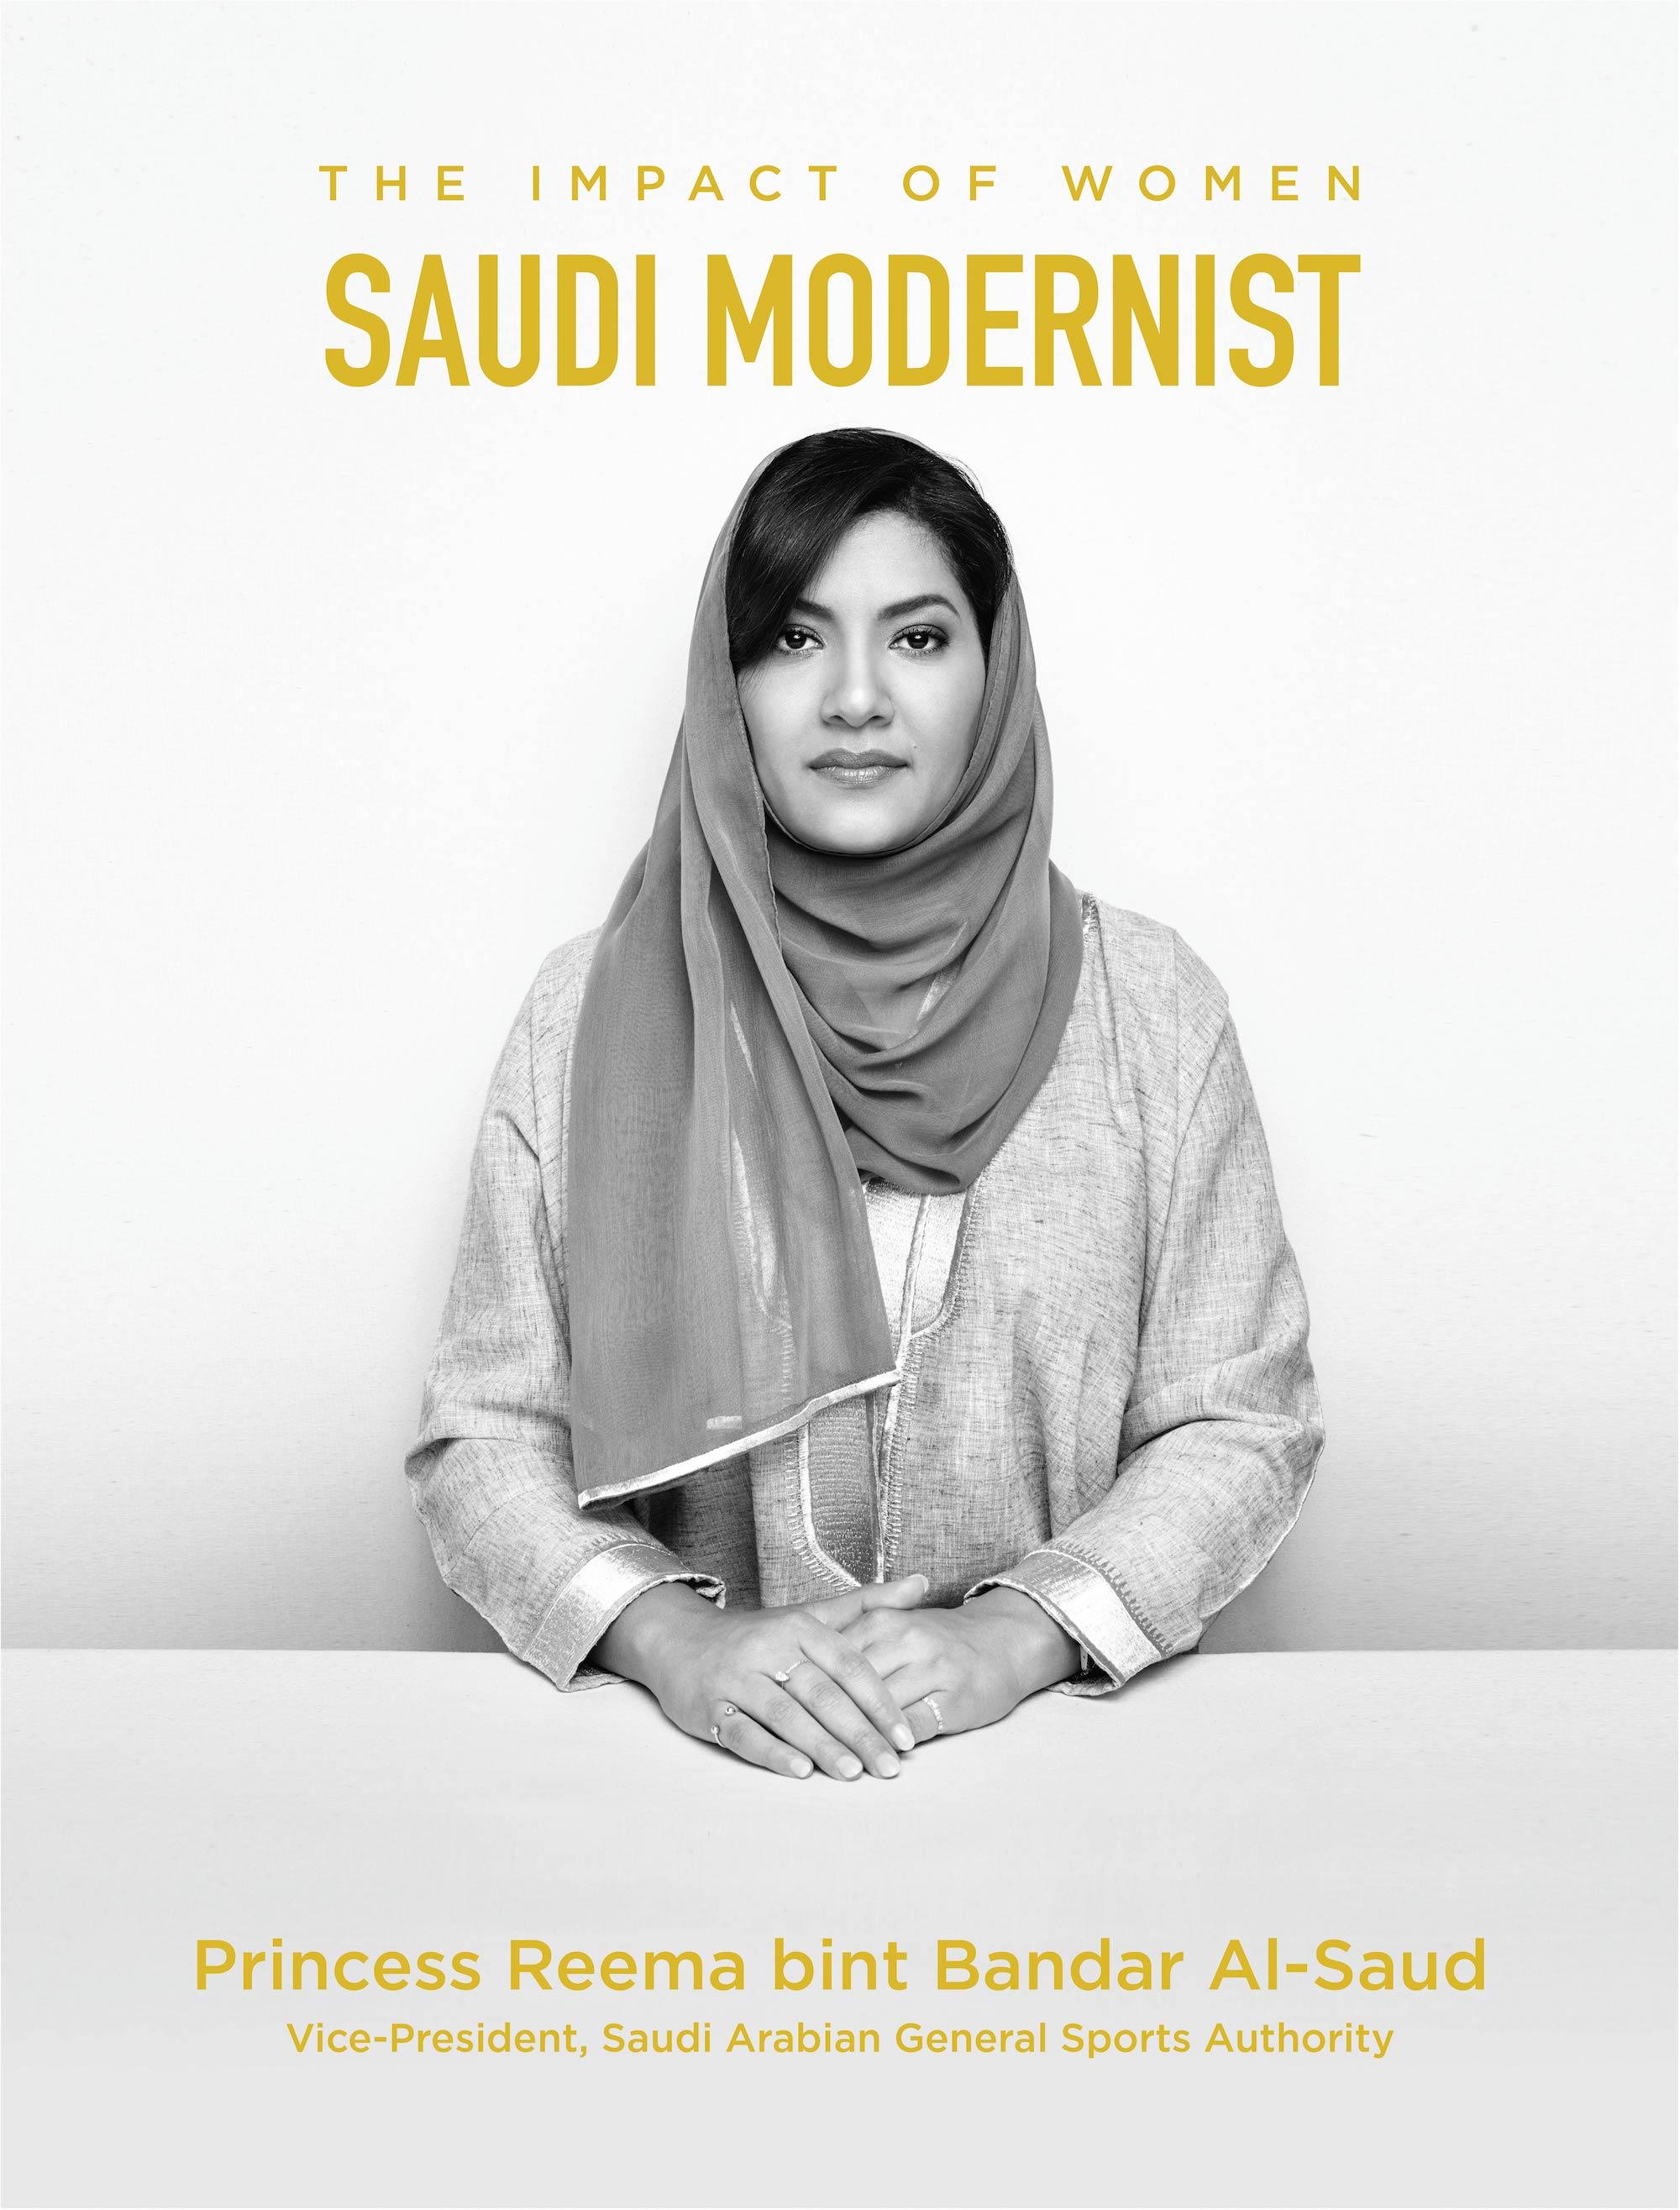 Princess Reema is a Saudi Modernist